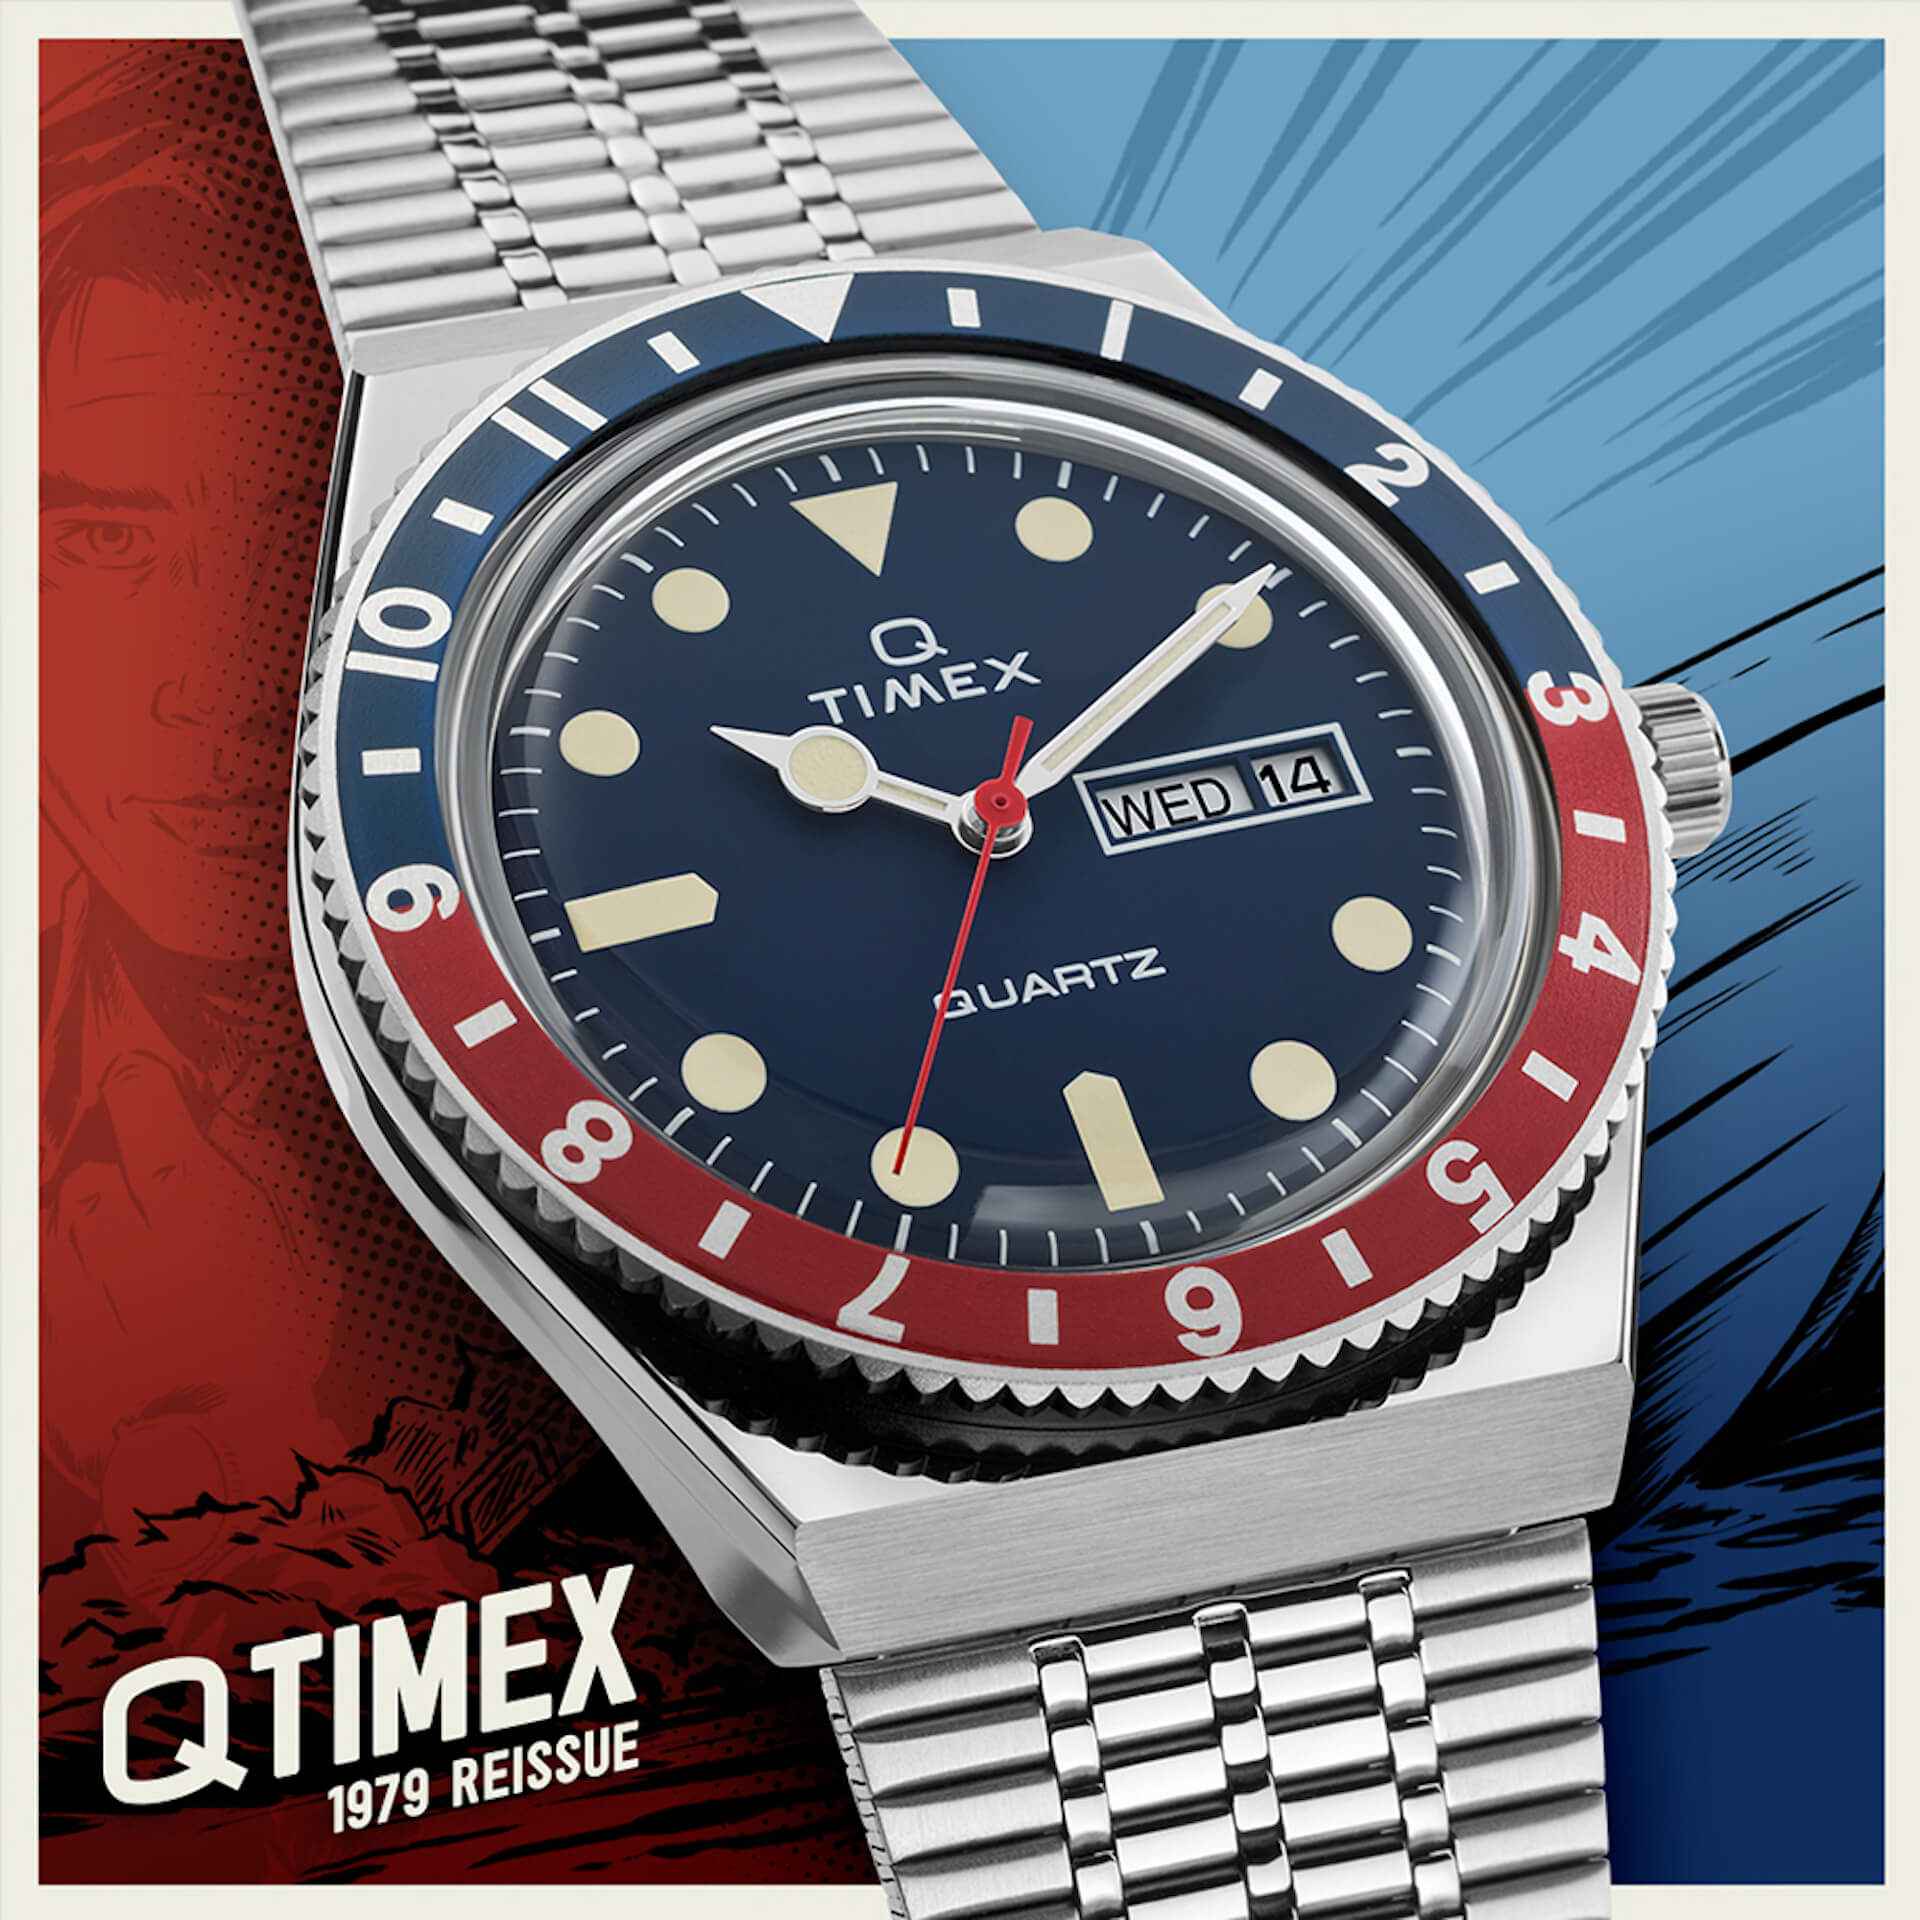 TIMEXの「Q TIMEX」シリーズ『M79』に新色ブラック×レッドカラーが登場!本日予約受付開始 tech210528_qtimex_5